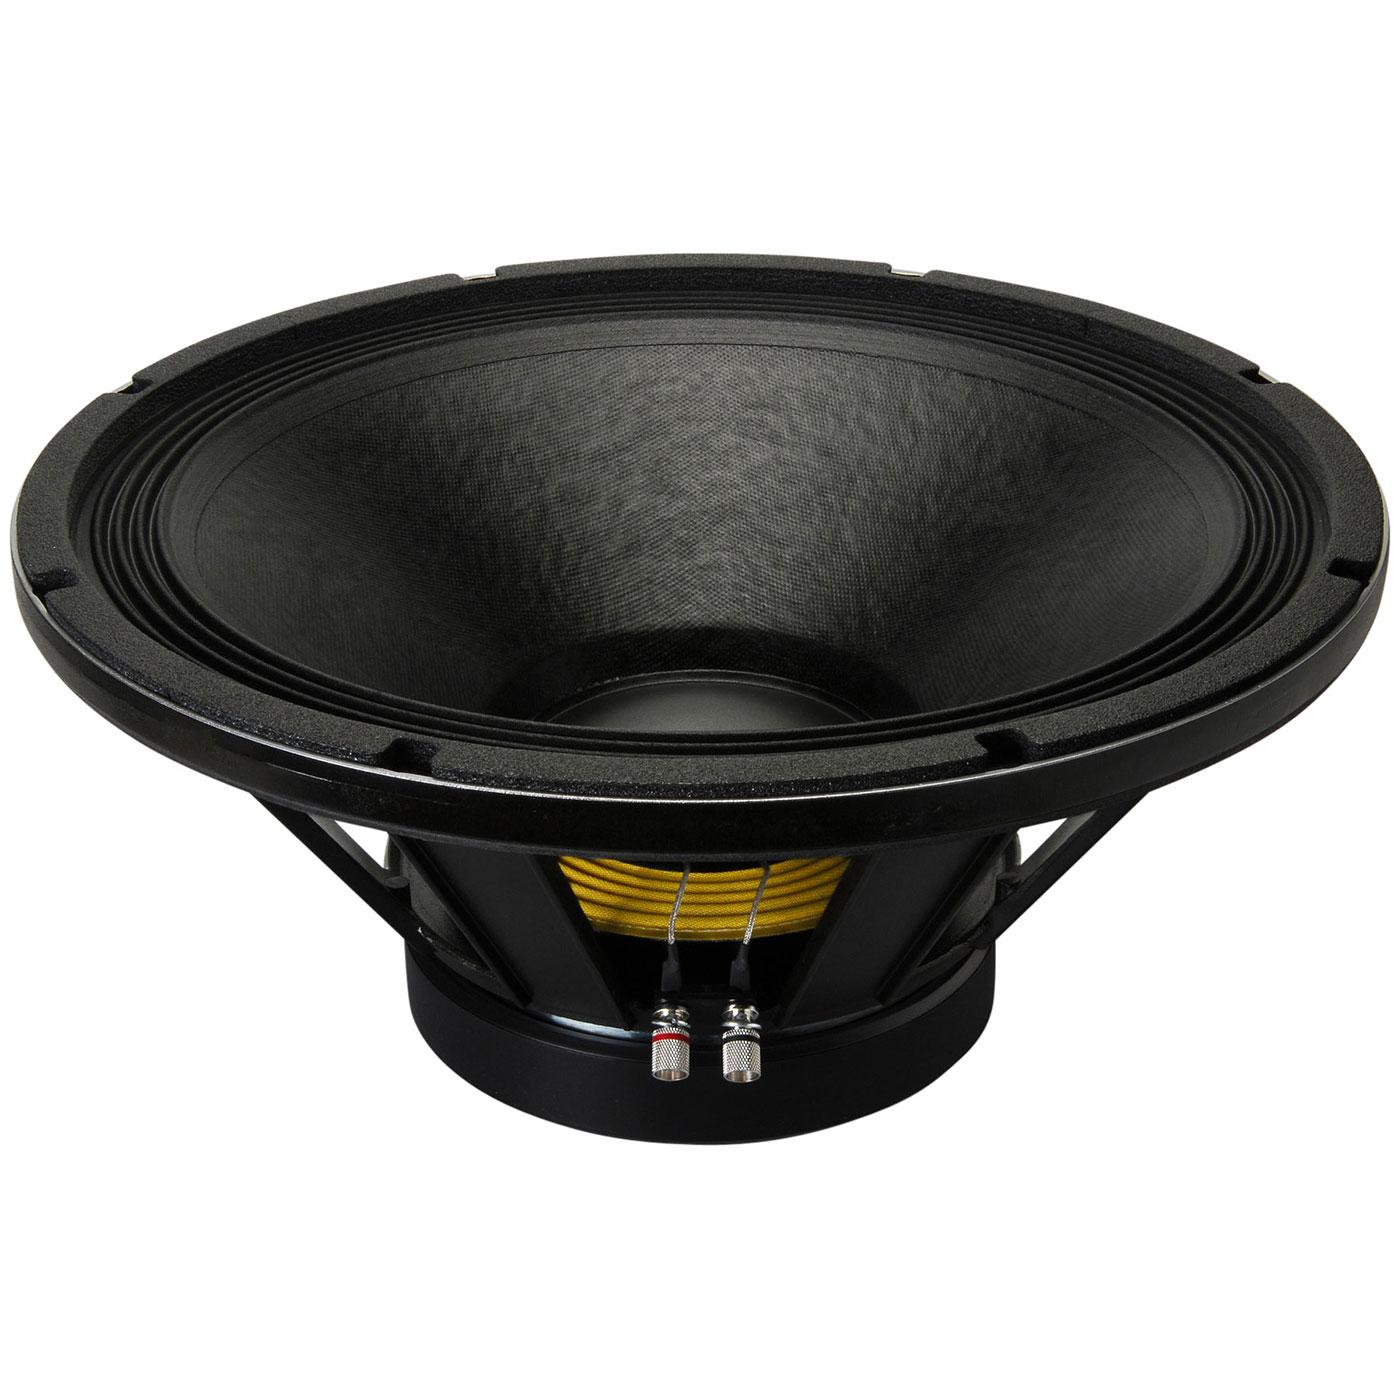 tinhte_eminece_impero_18a_woofer_speakers.jpg